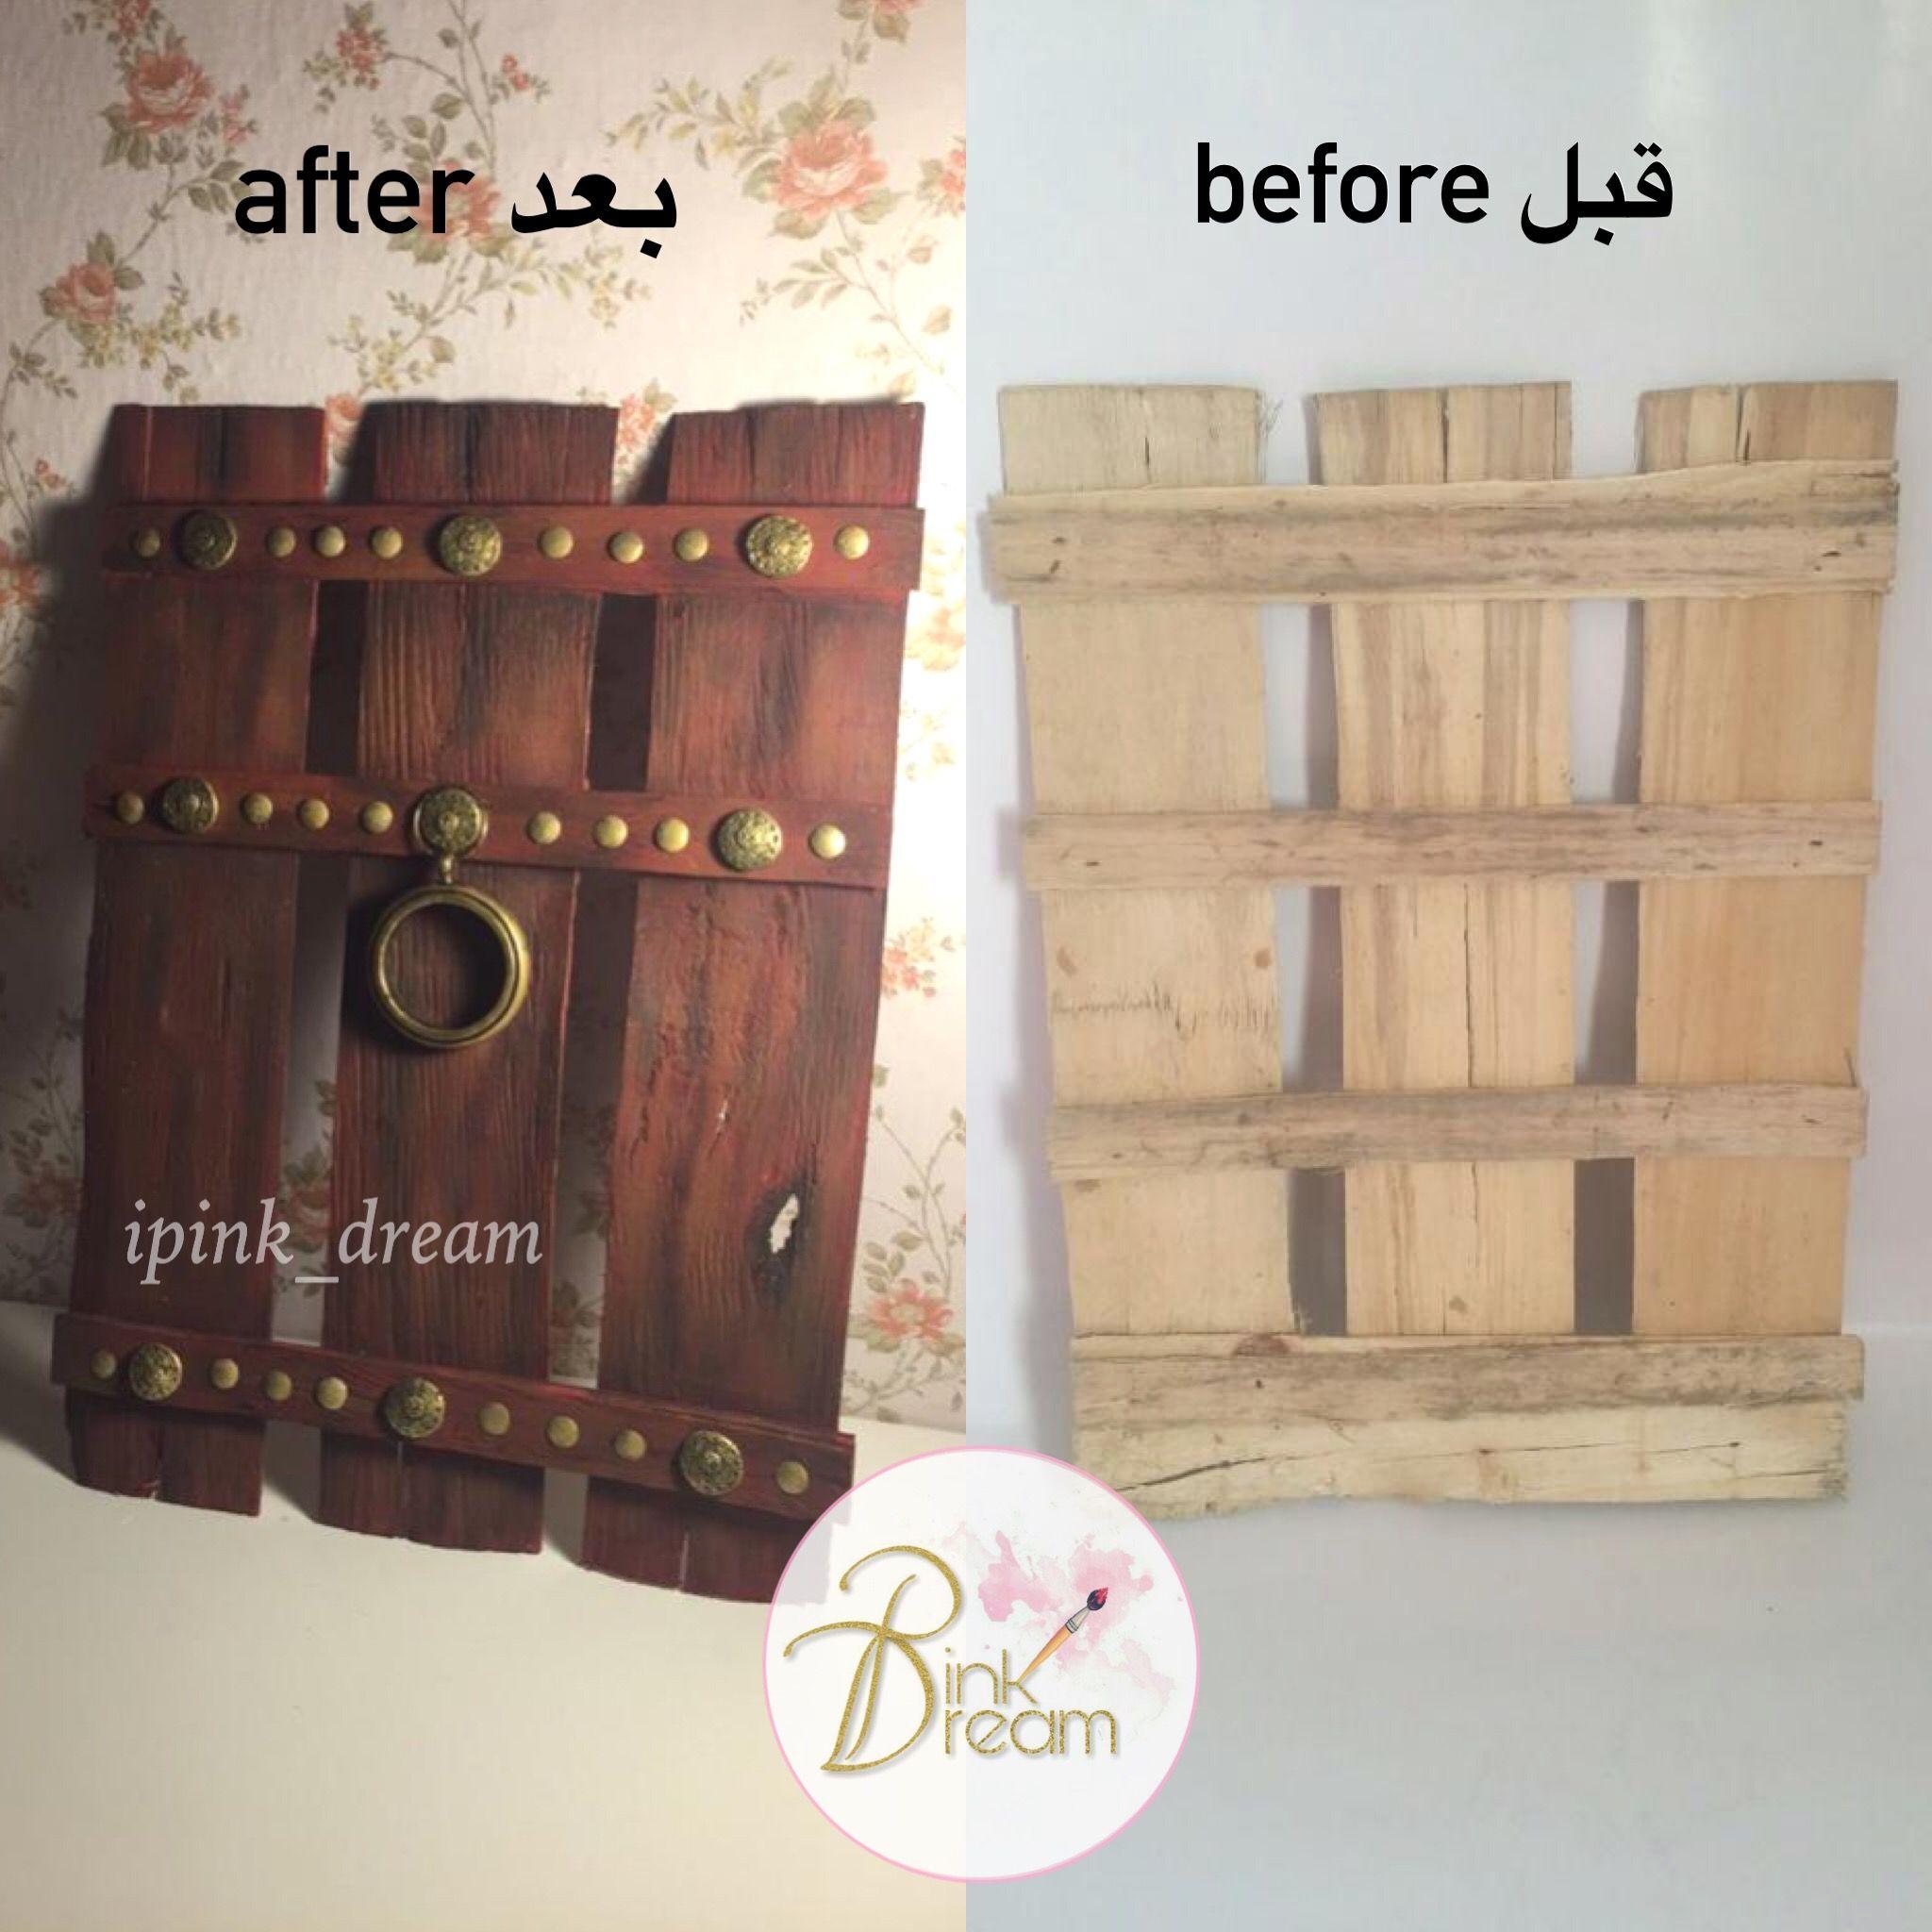 اعادة تدوير قبل وبعد Recycle Recycling Before After Antique Door Wood Bottle Opener Wall Wall Bottle